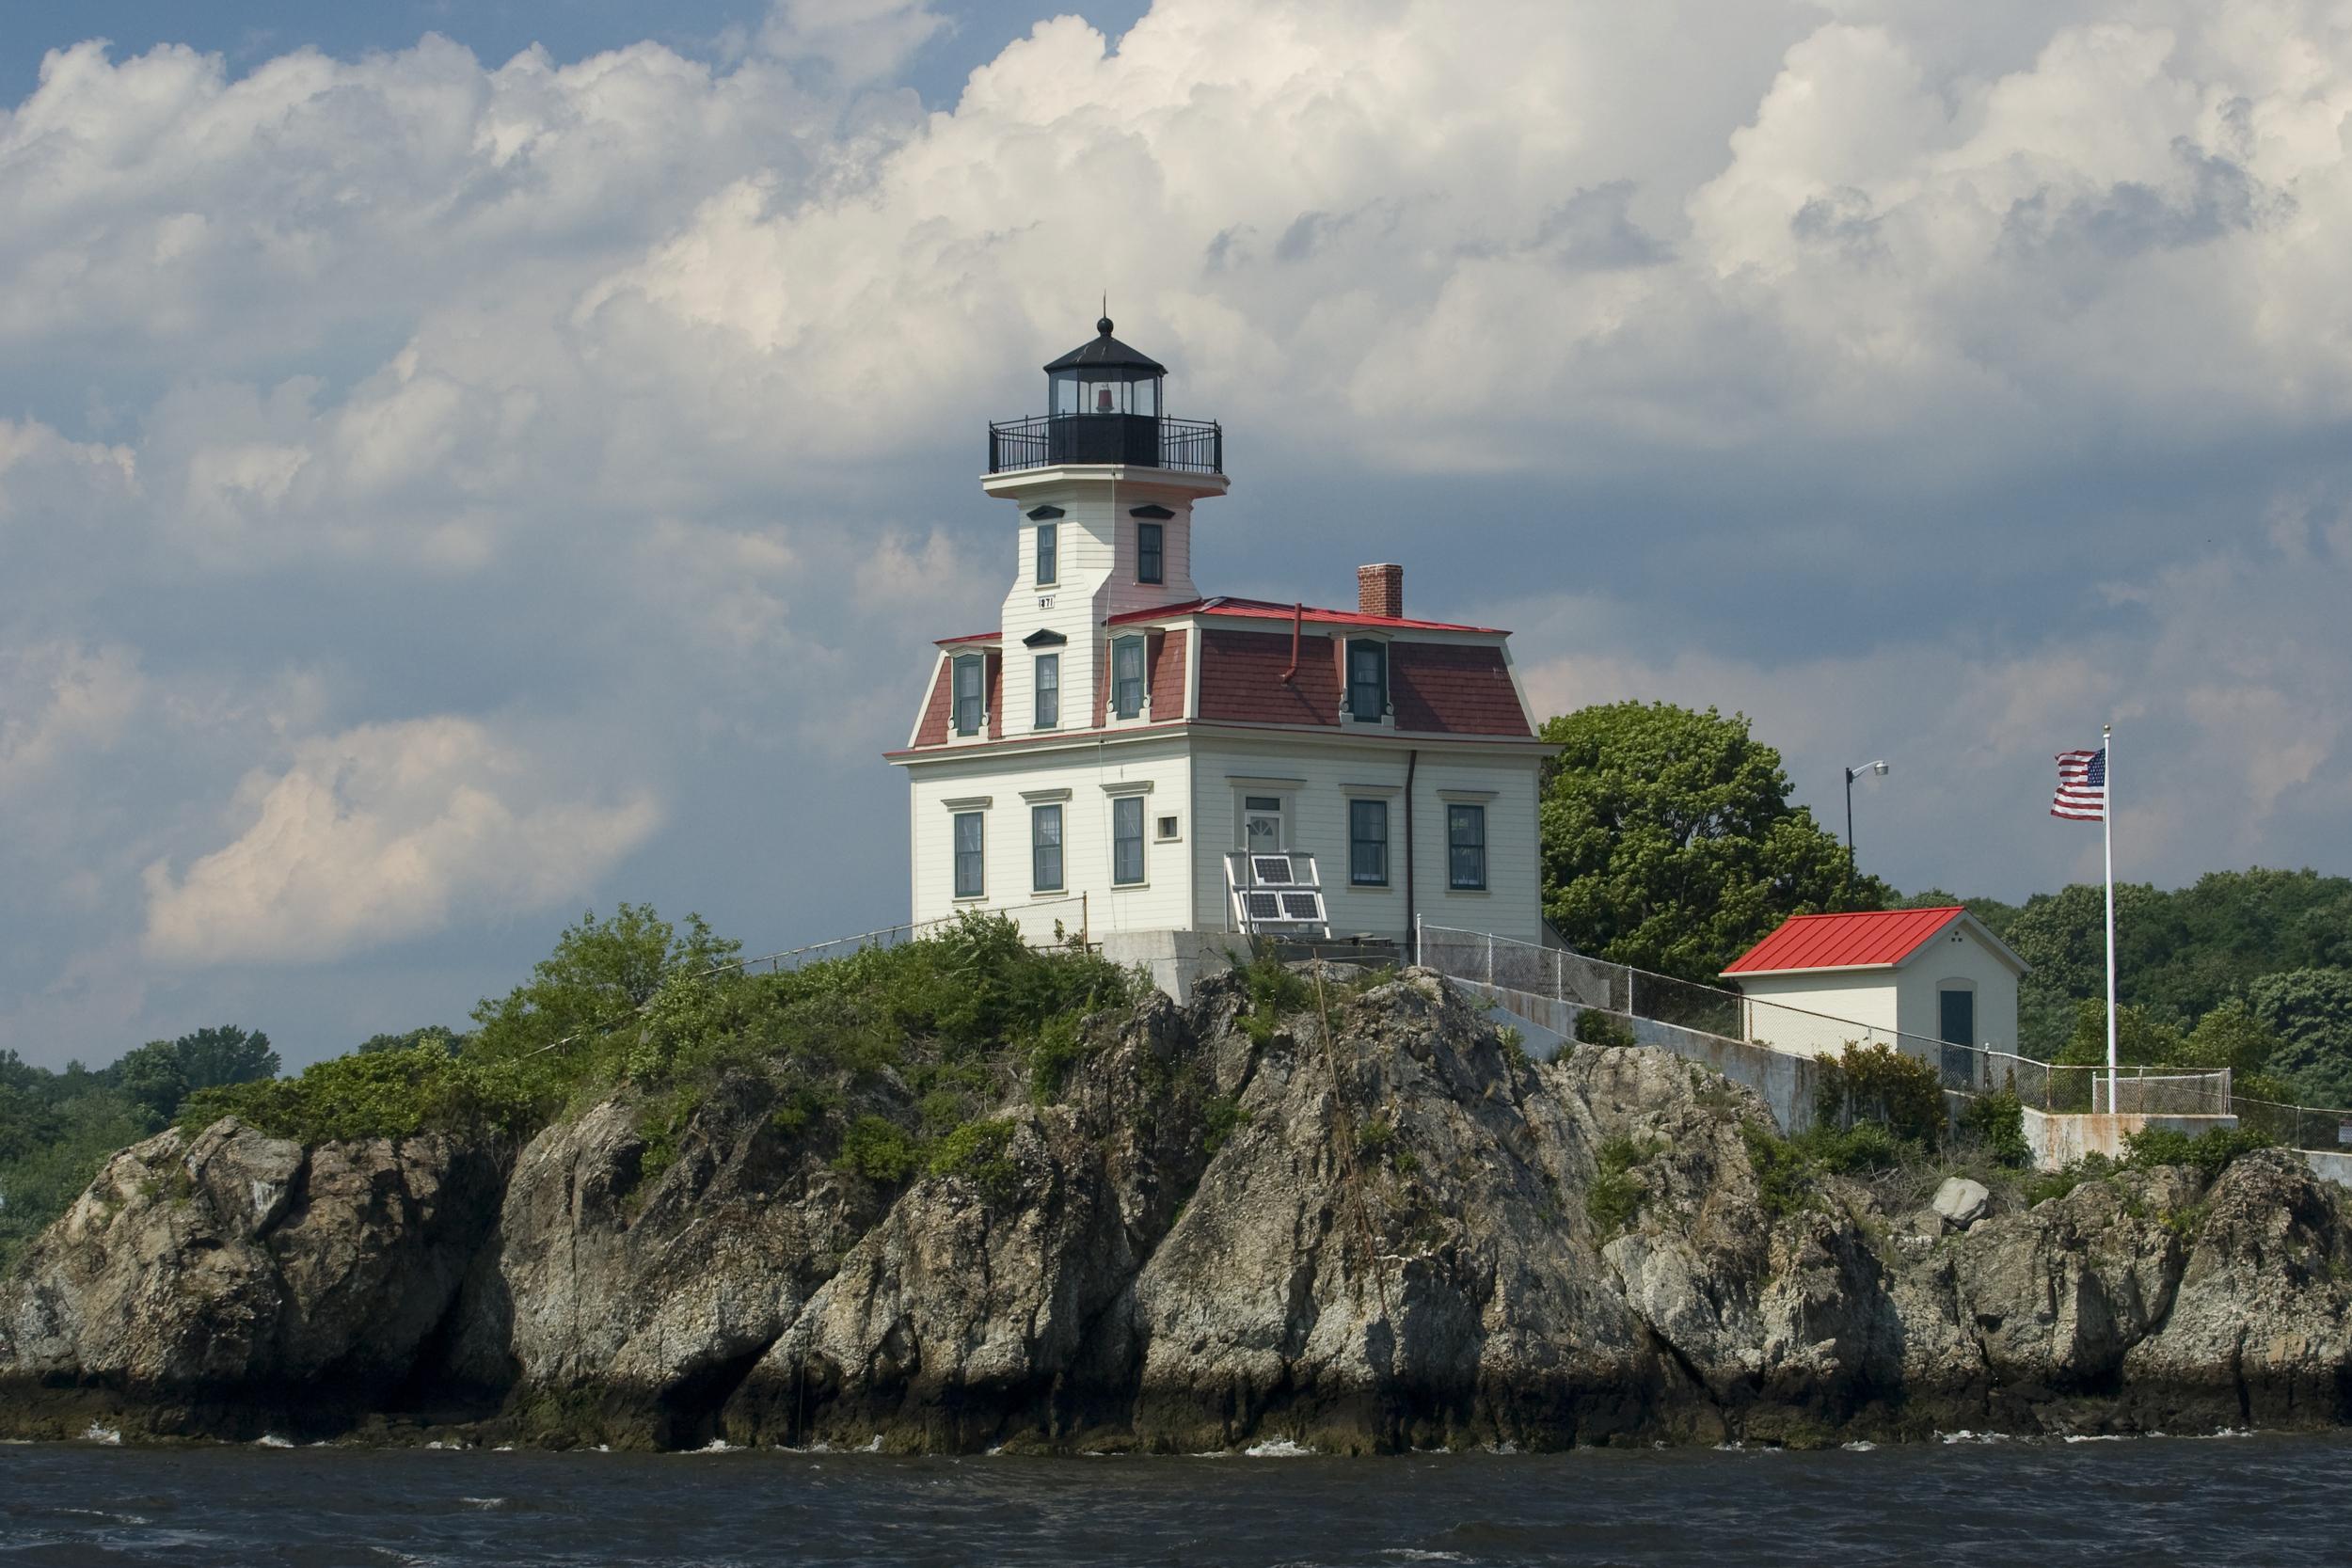 The Pomham Rocks Lighthouse